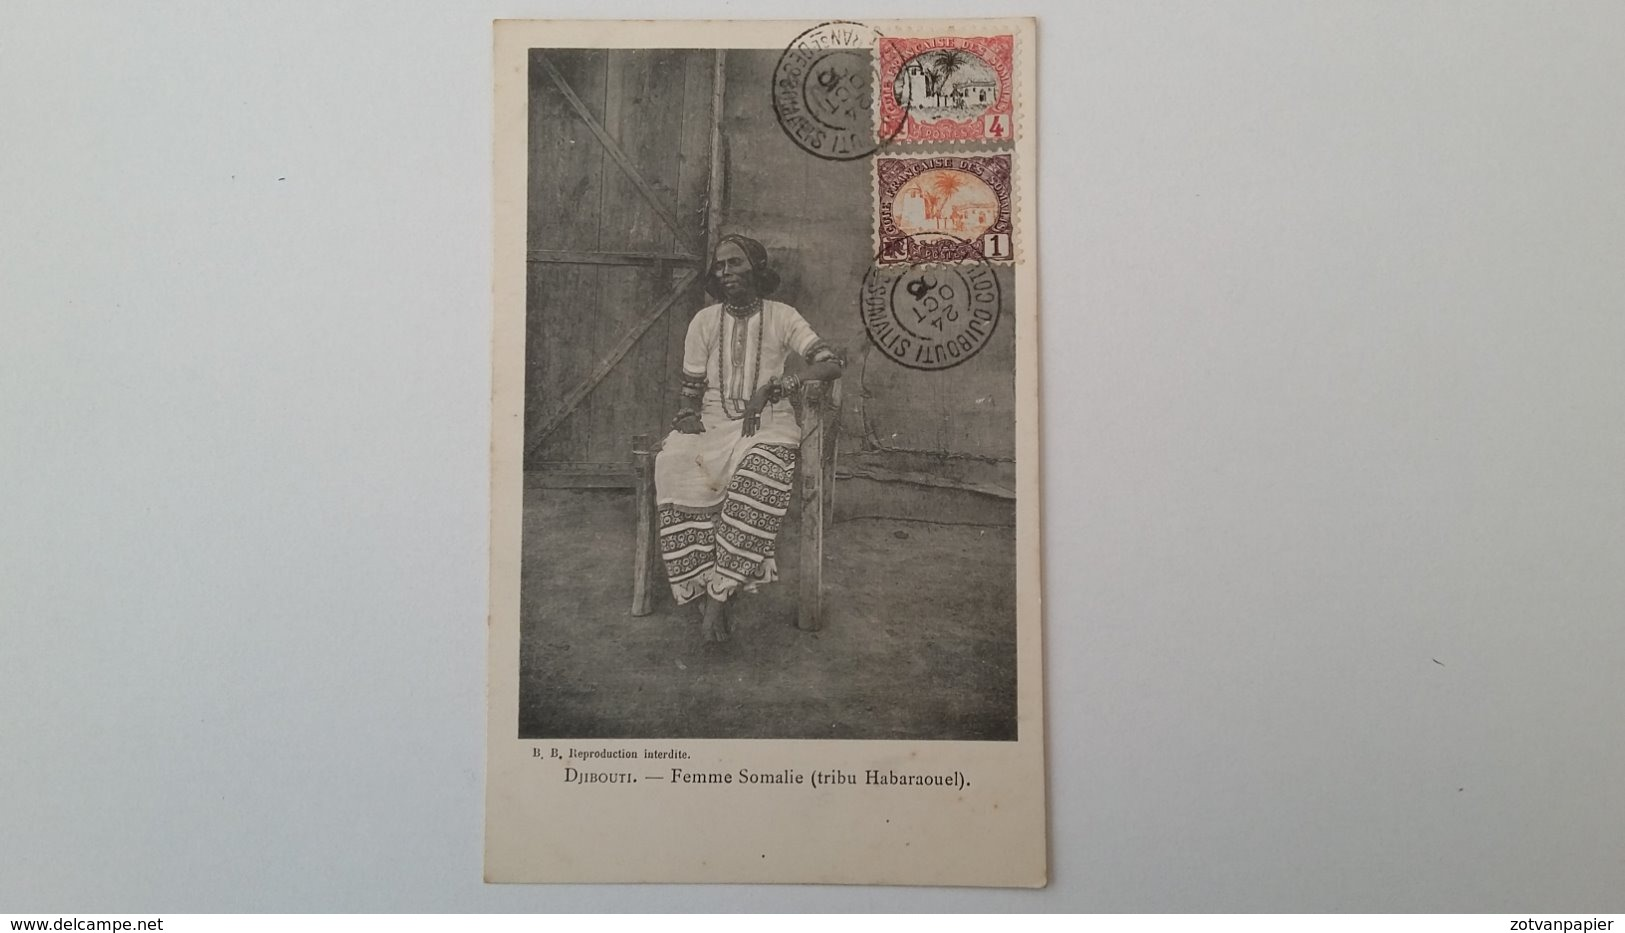 DJIBOUTI - FEMME SOMALIE (TRIBU HABARAOUEL) 1905 - Djibouti